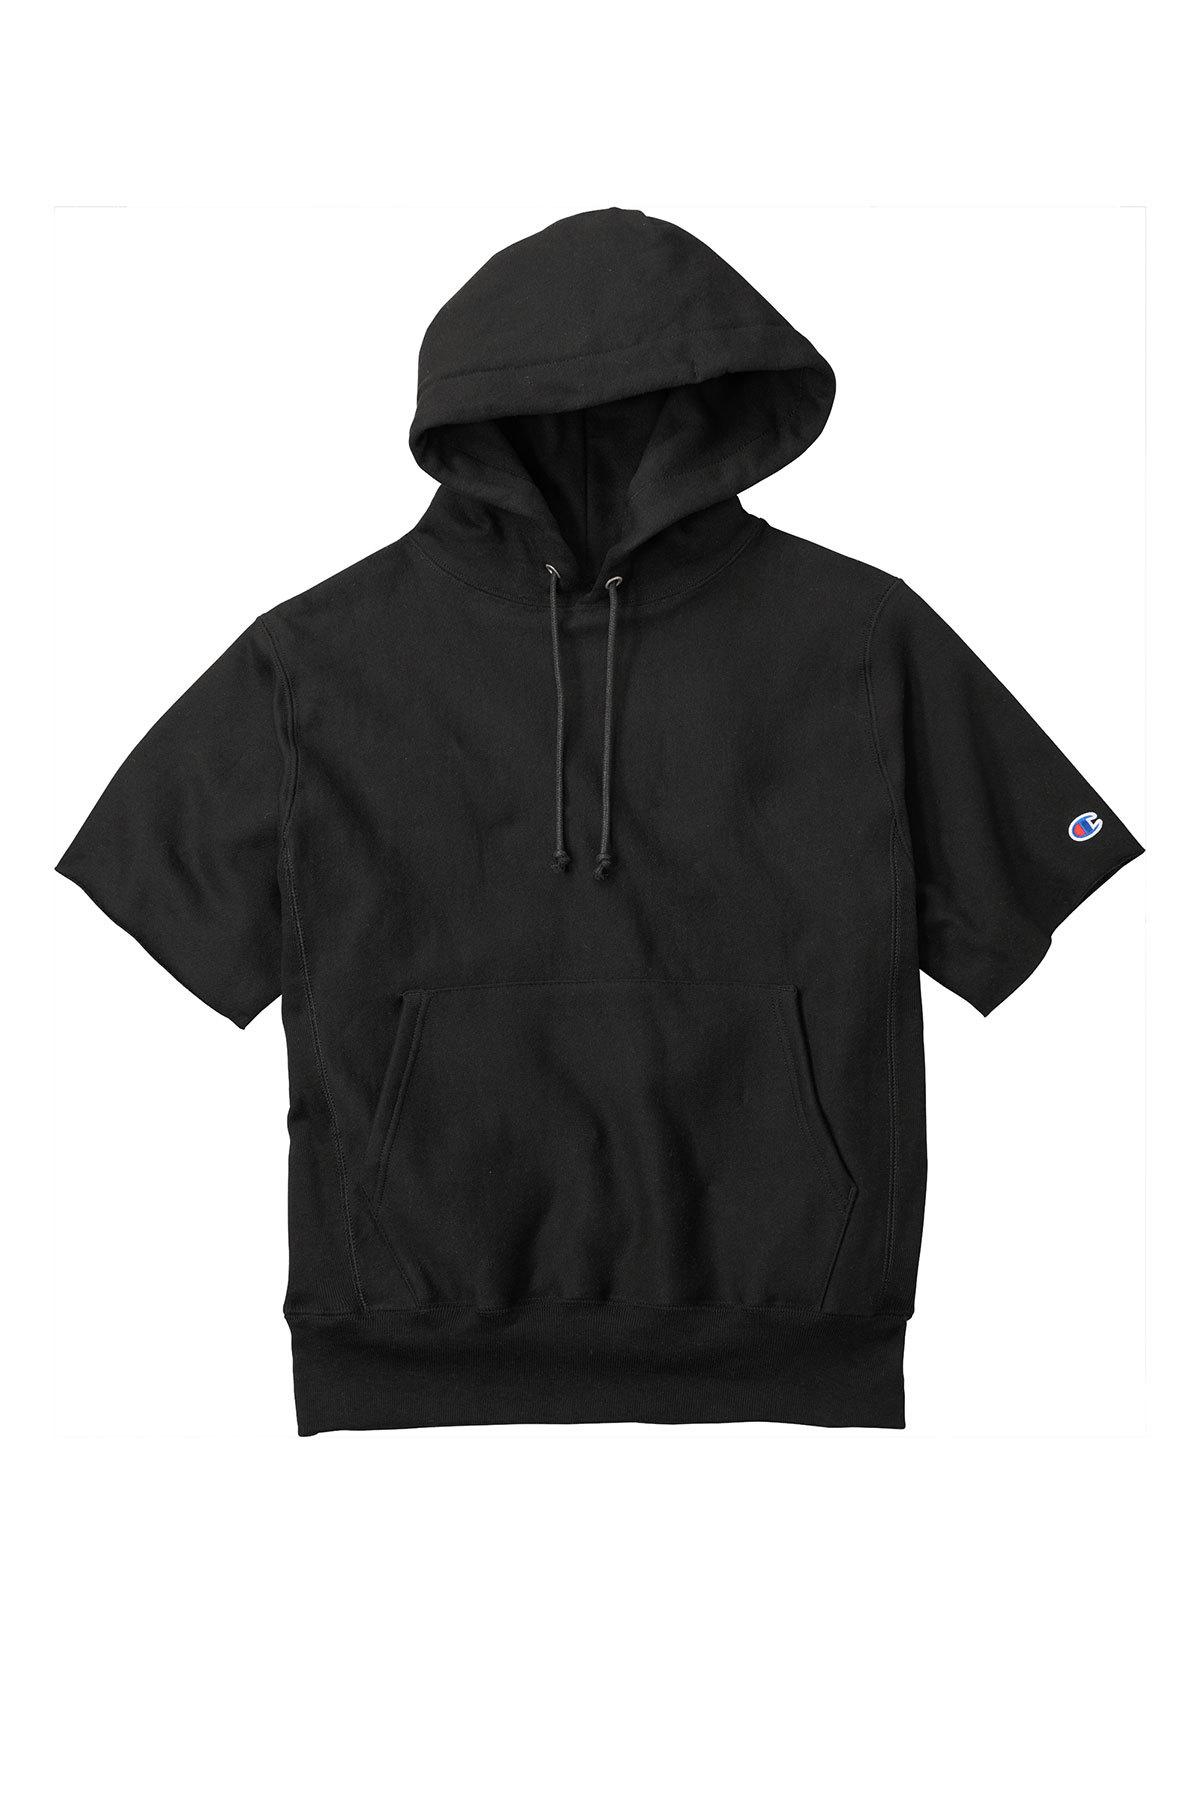 Champion S101SS - Reverse Weave Short Sleeve Hooded Sweatshirt